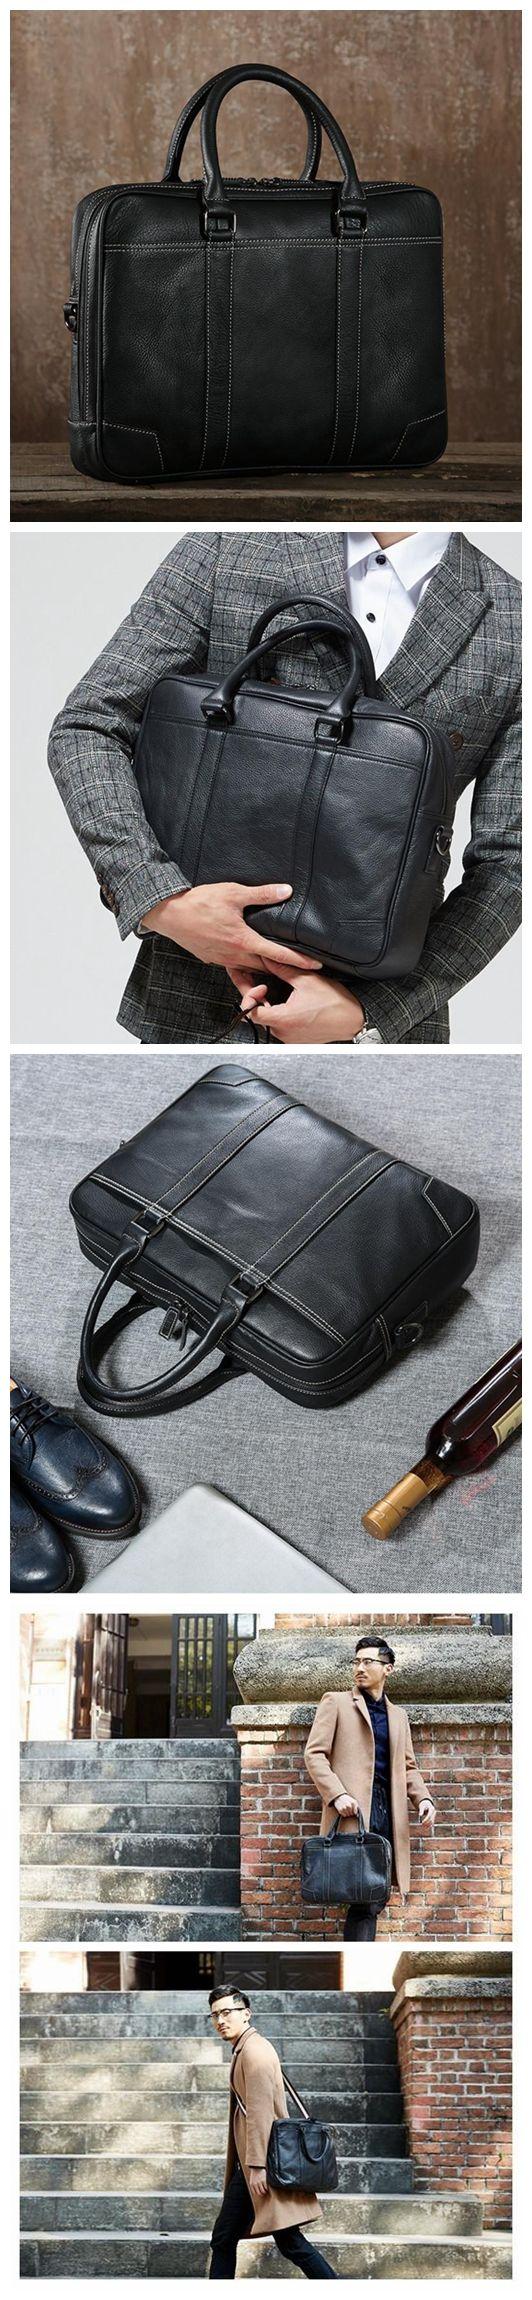 Mens fashion laptop bag 69